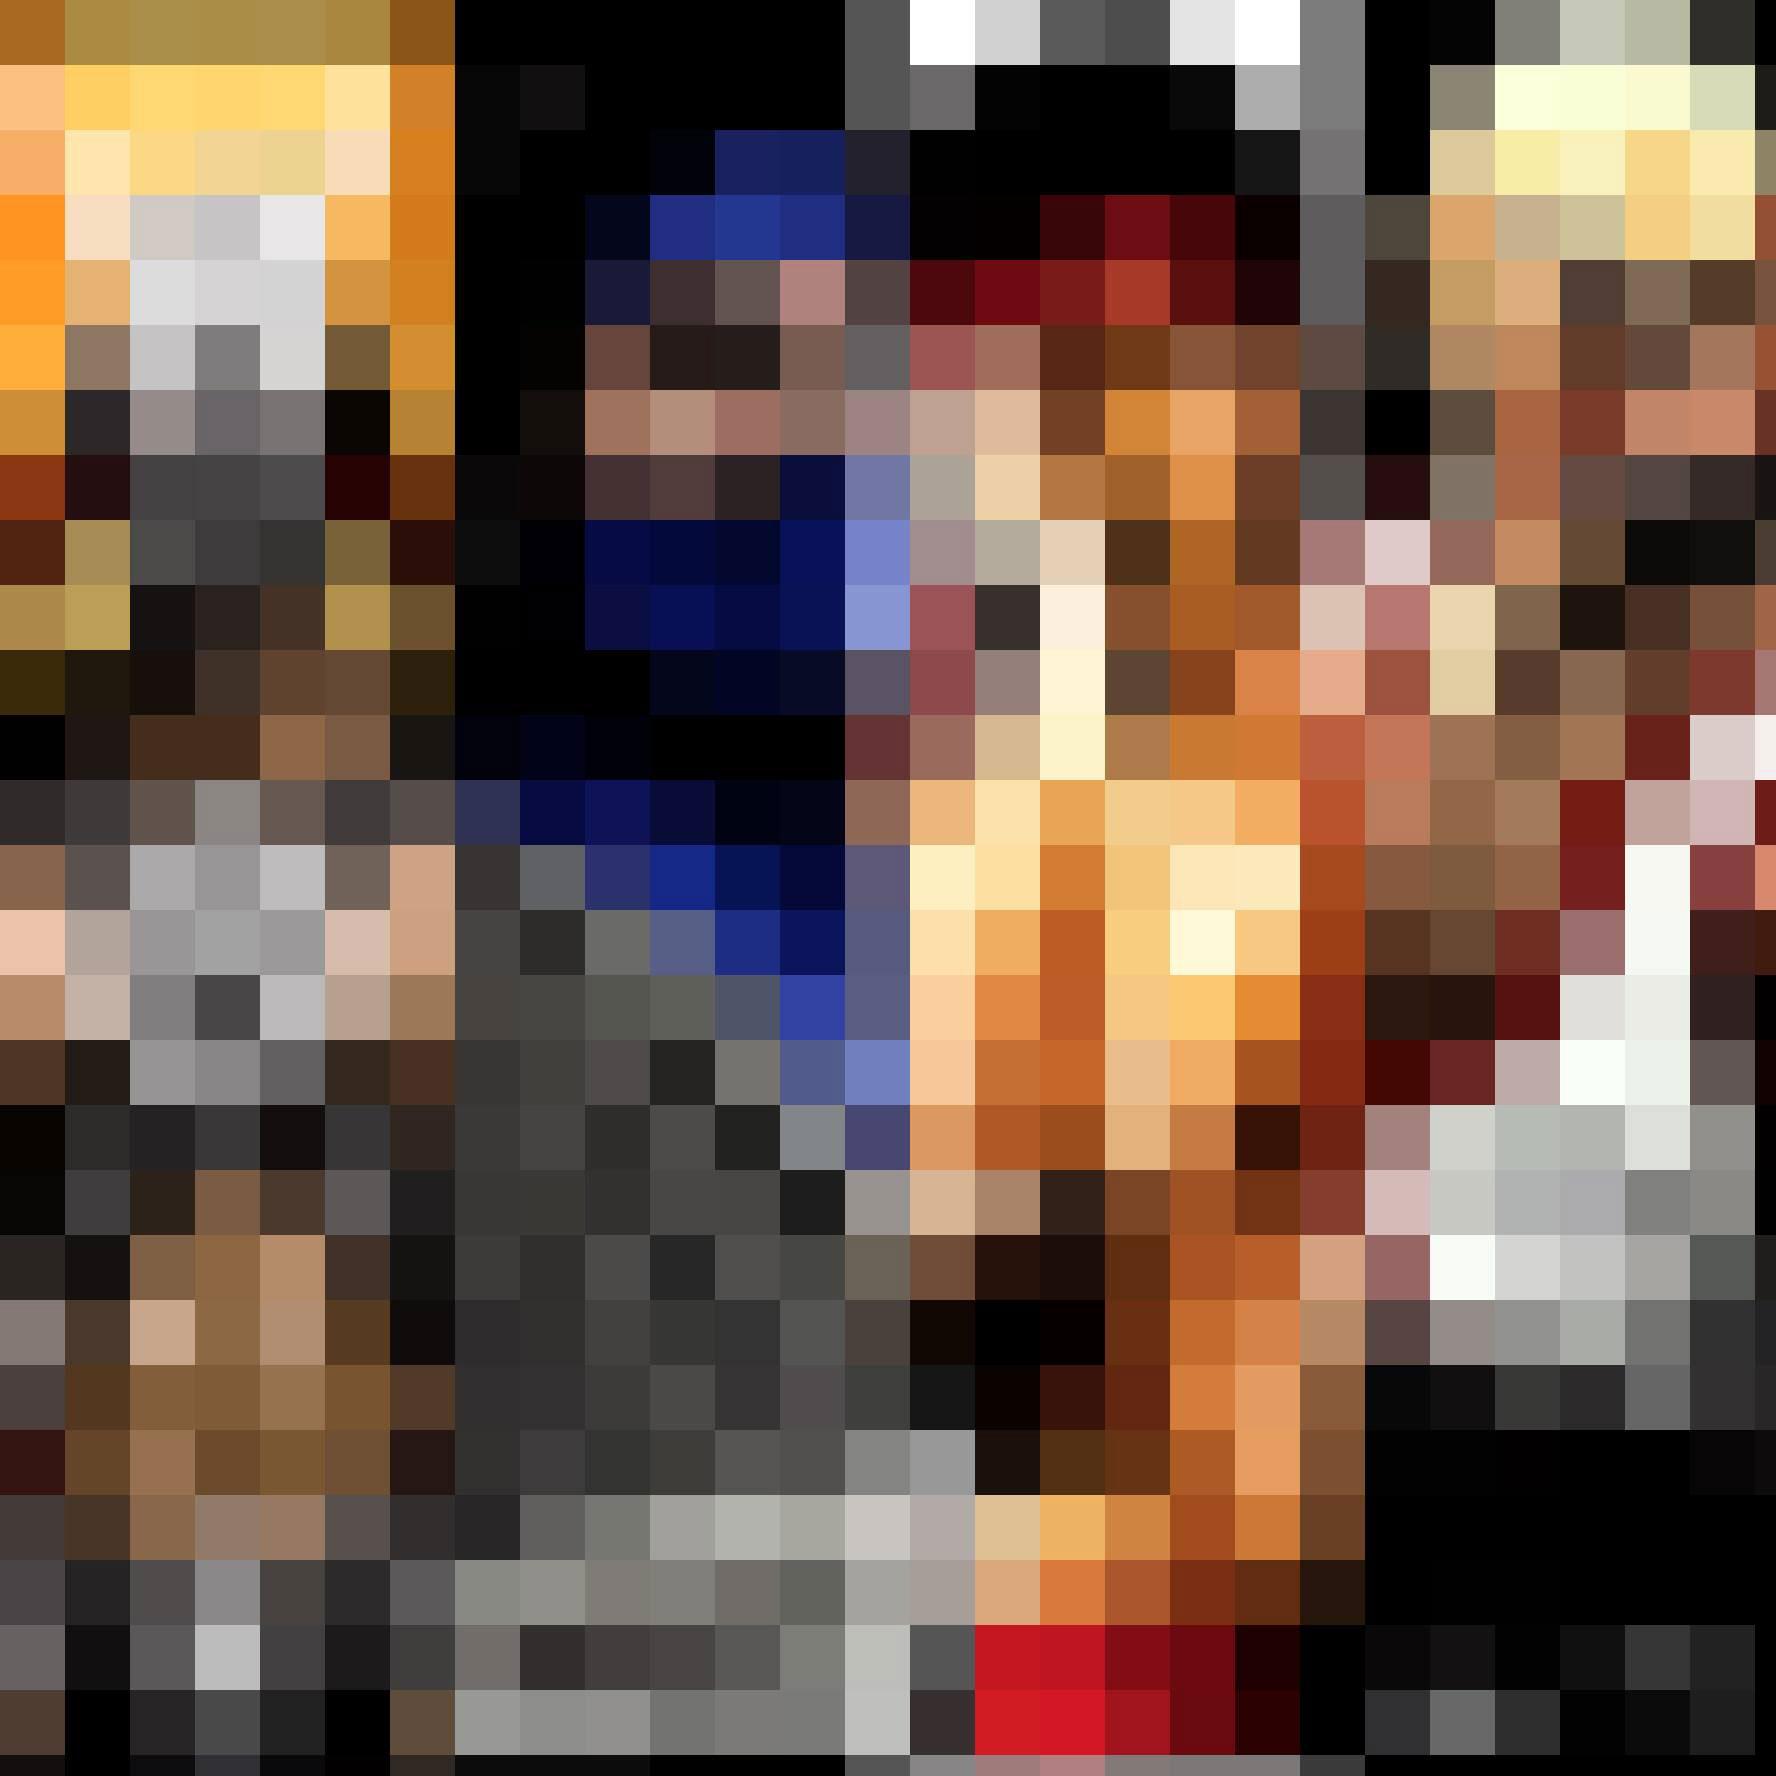 storm-collectibles-mortal-kombat-new-action-figures-teaser